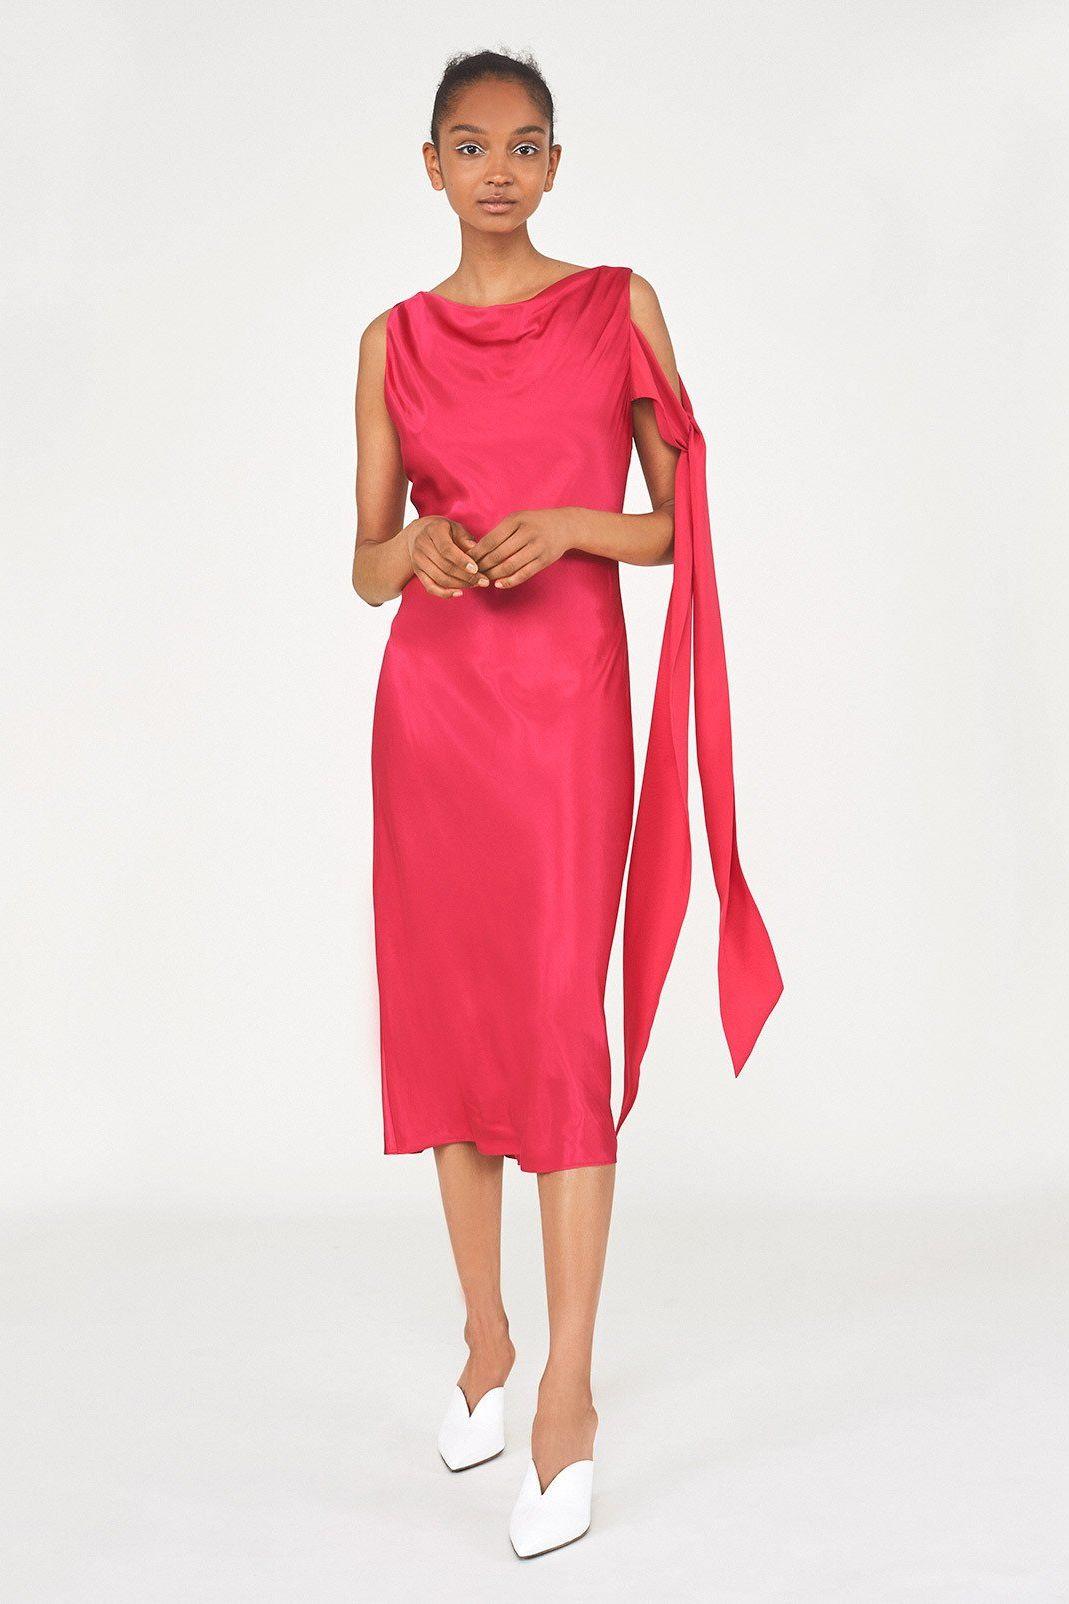 Kitri Sarah Arm Sash Dress 2 Preview Images